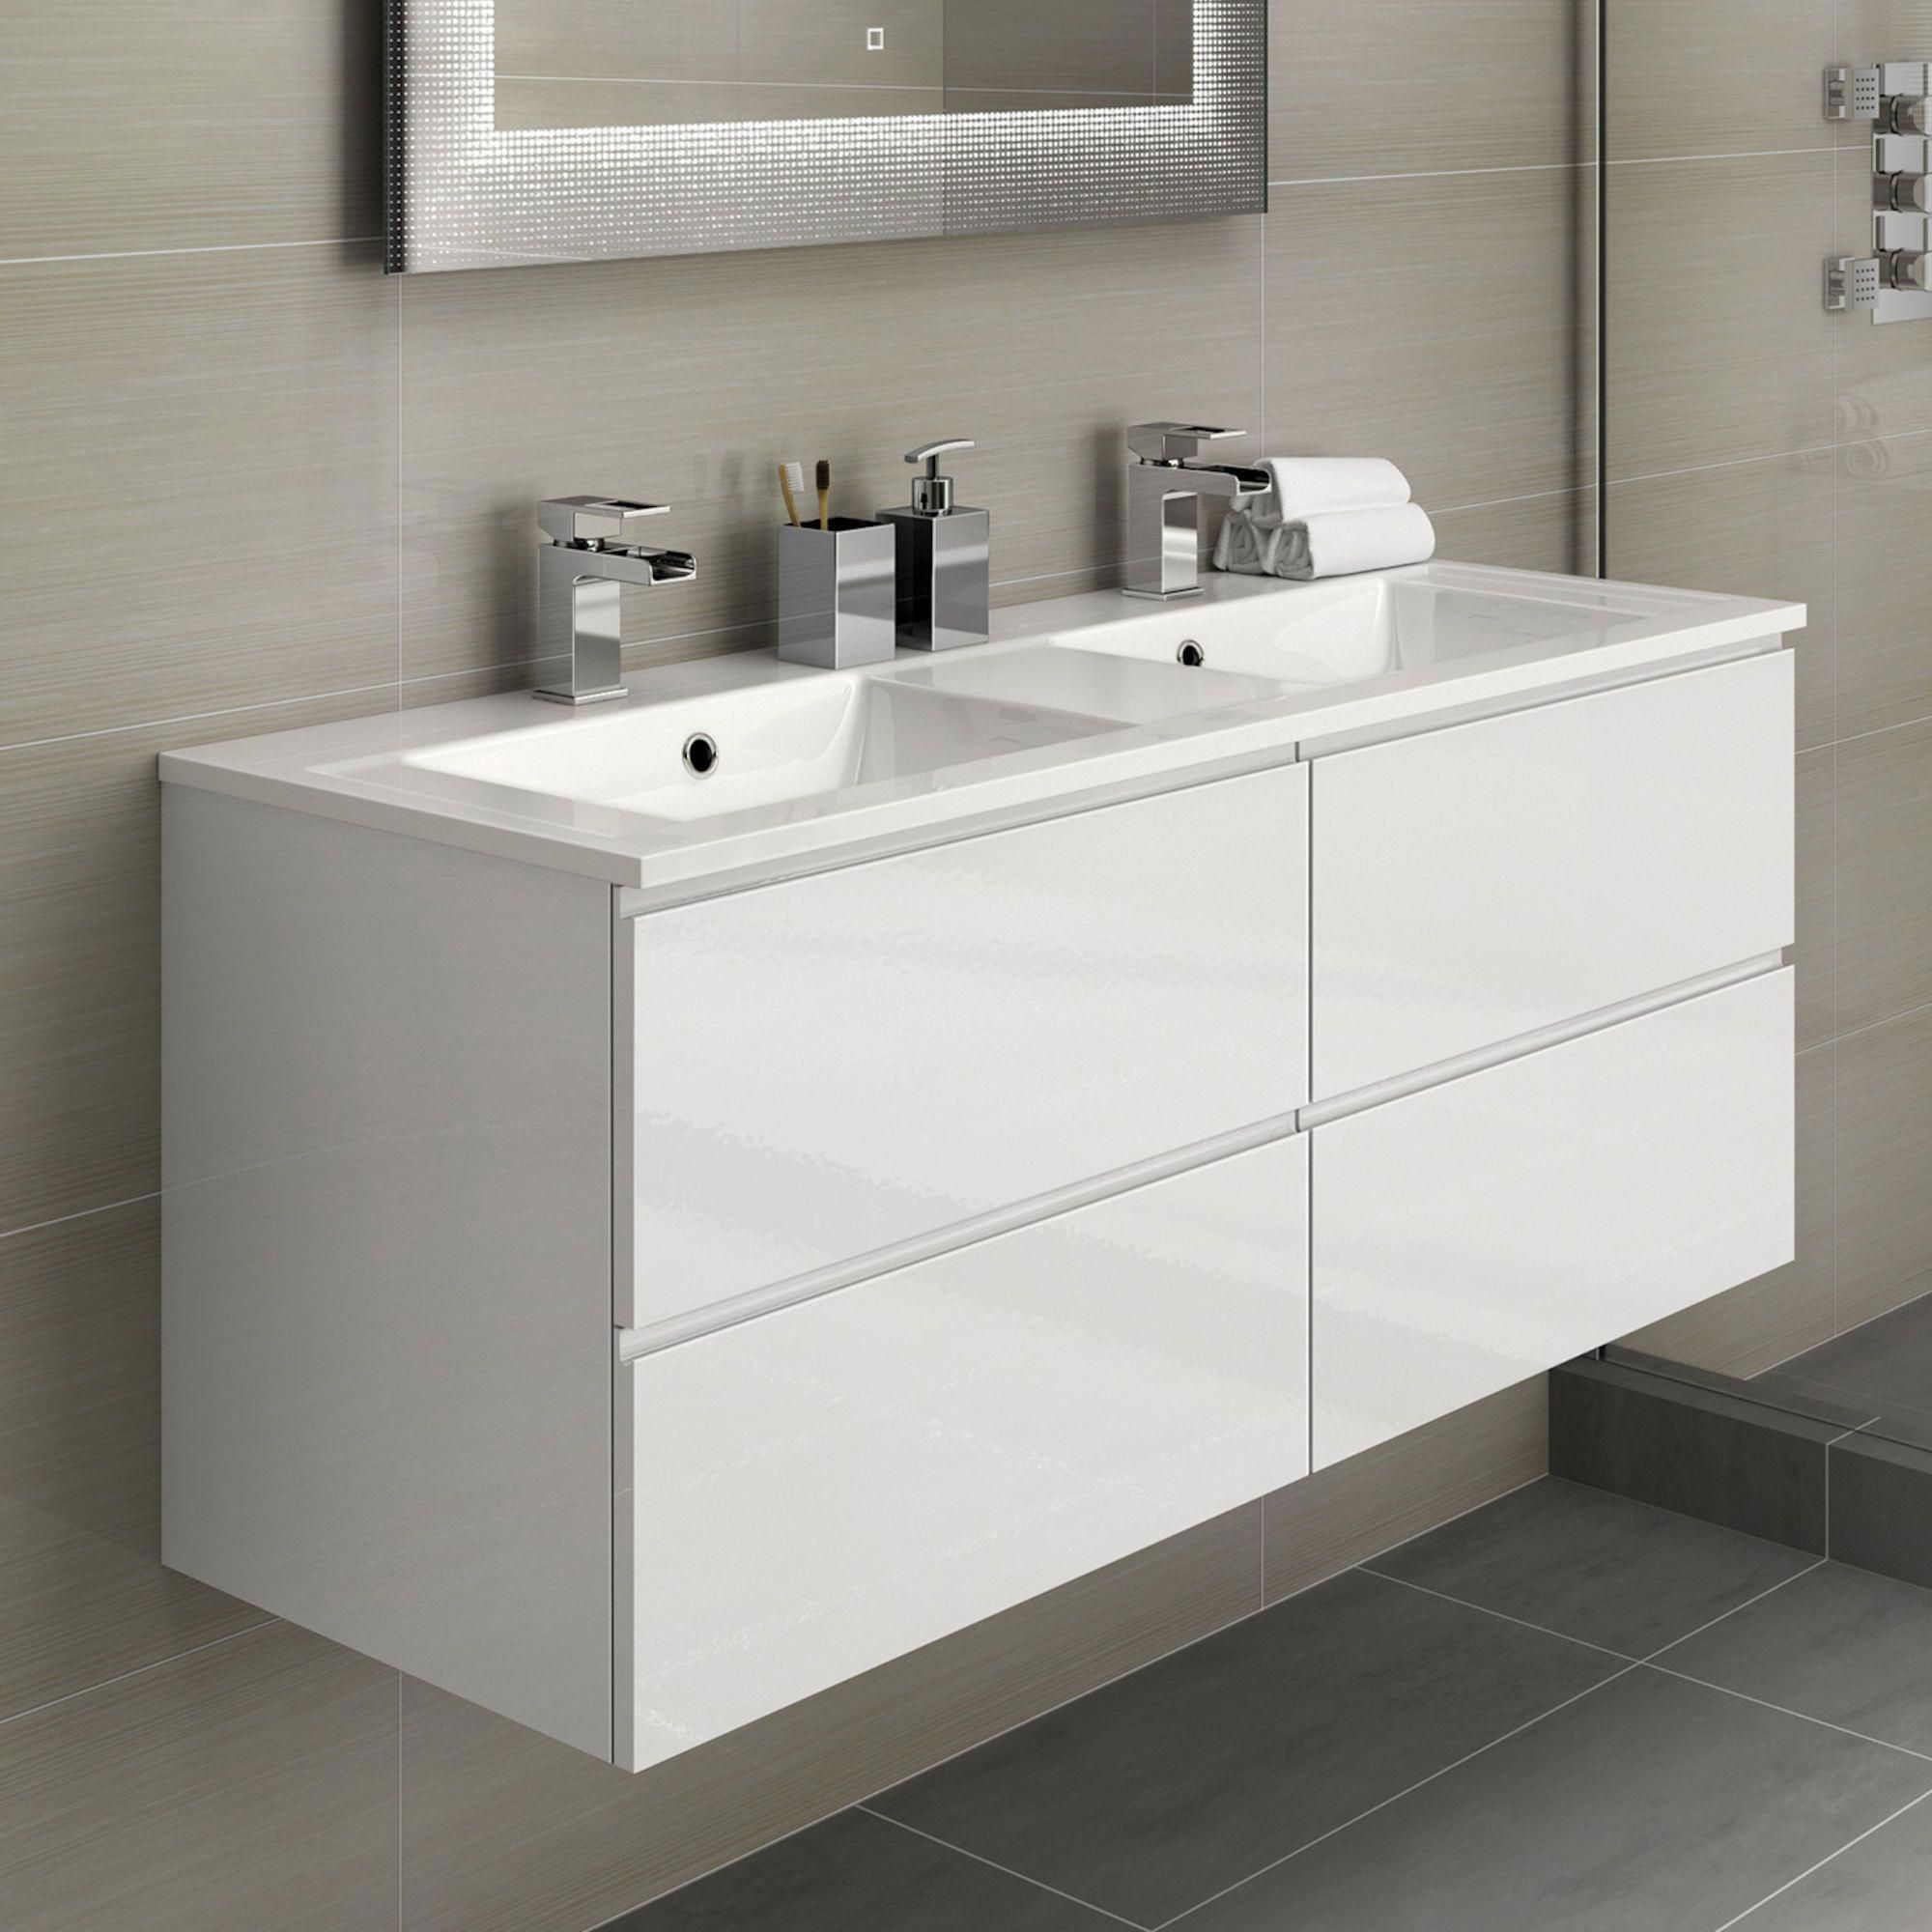 1200mm Trevia High Gloss White Double Basin Cabinet Wall Hung Ensuitebathroomideas Bathroom Vanity Units Bathroom Furniture Storage Double Vanity Bathroom